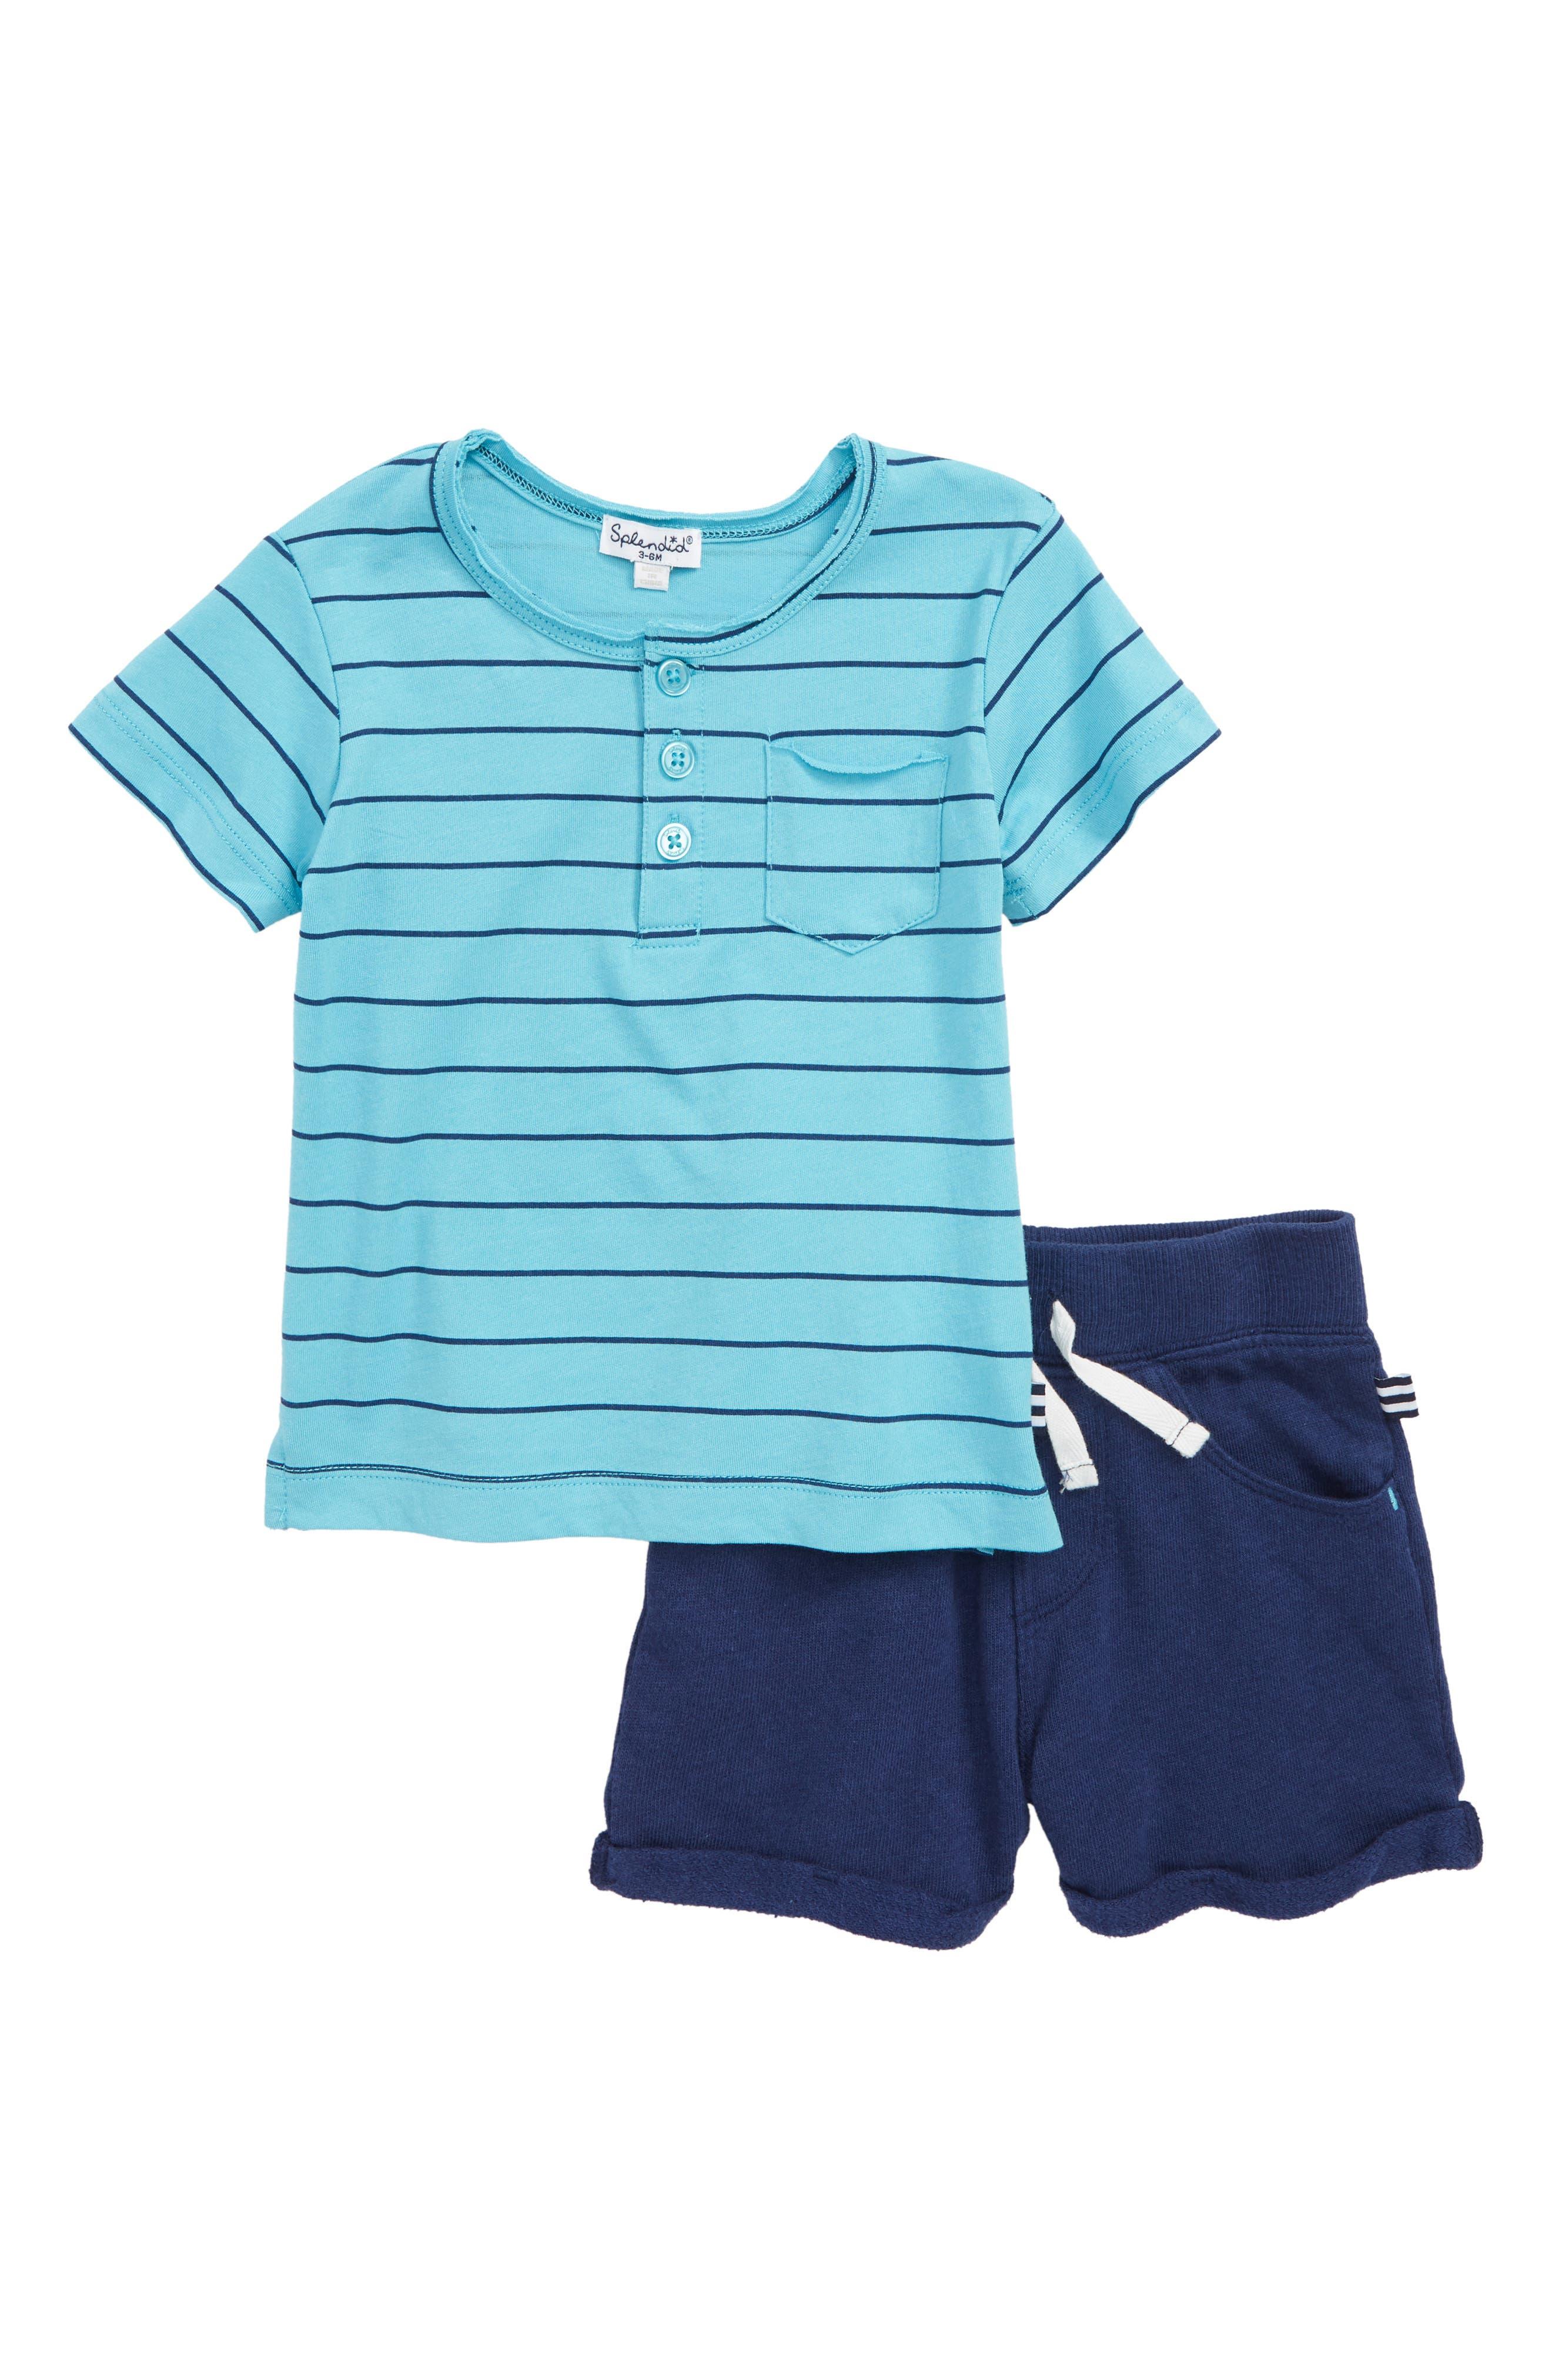 Henley T-Shirt & Shorts Set,                             Main thumbnail 1, color,                             Maui Blue